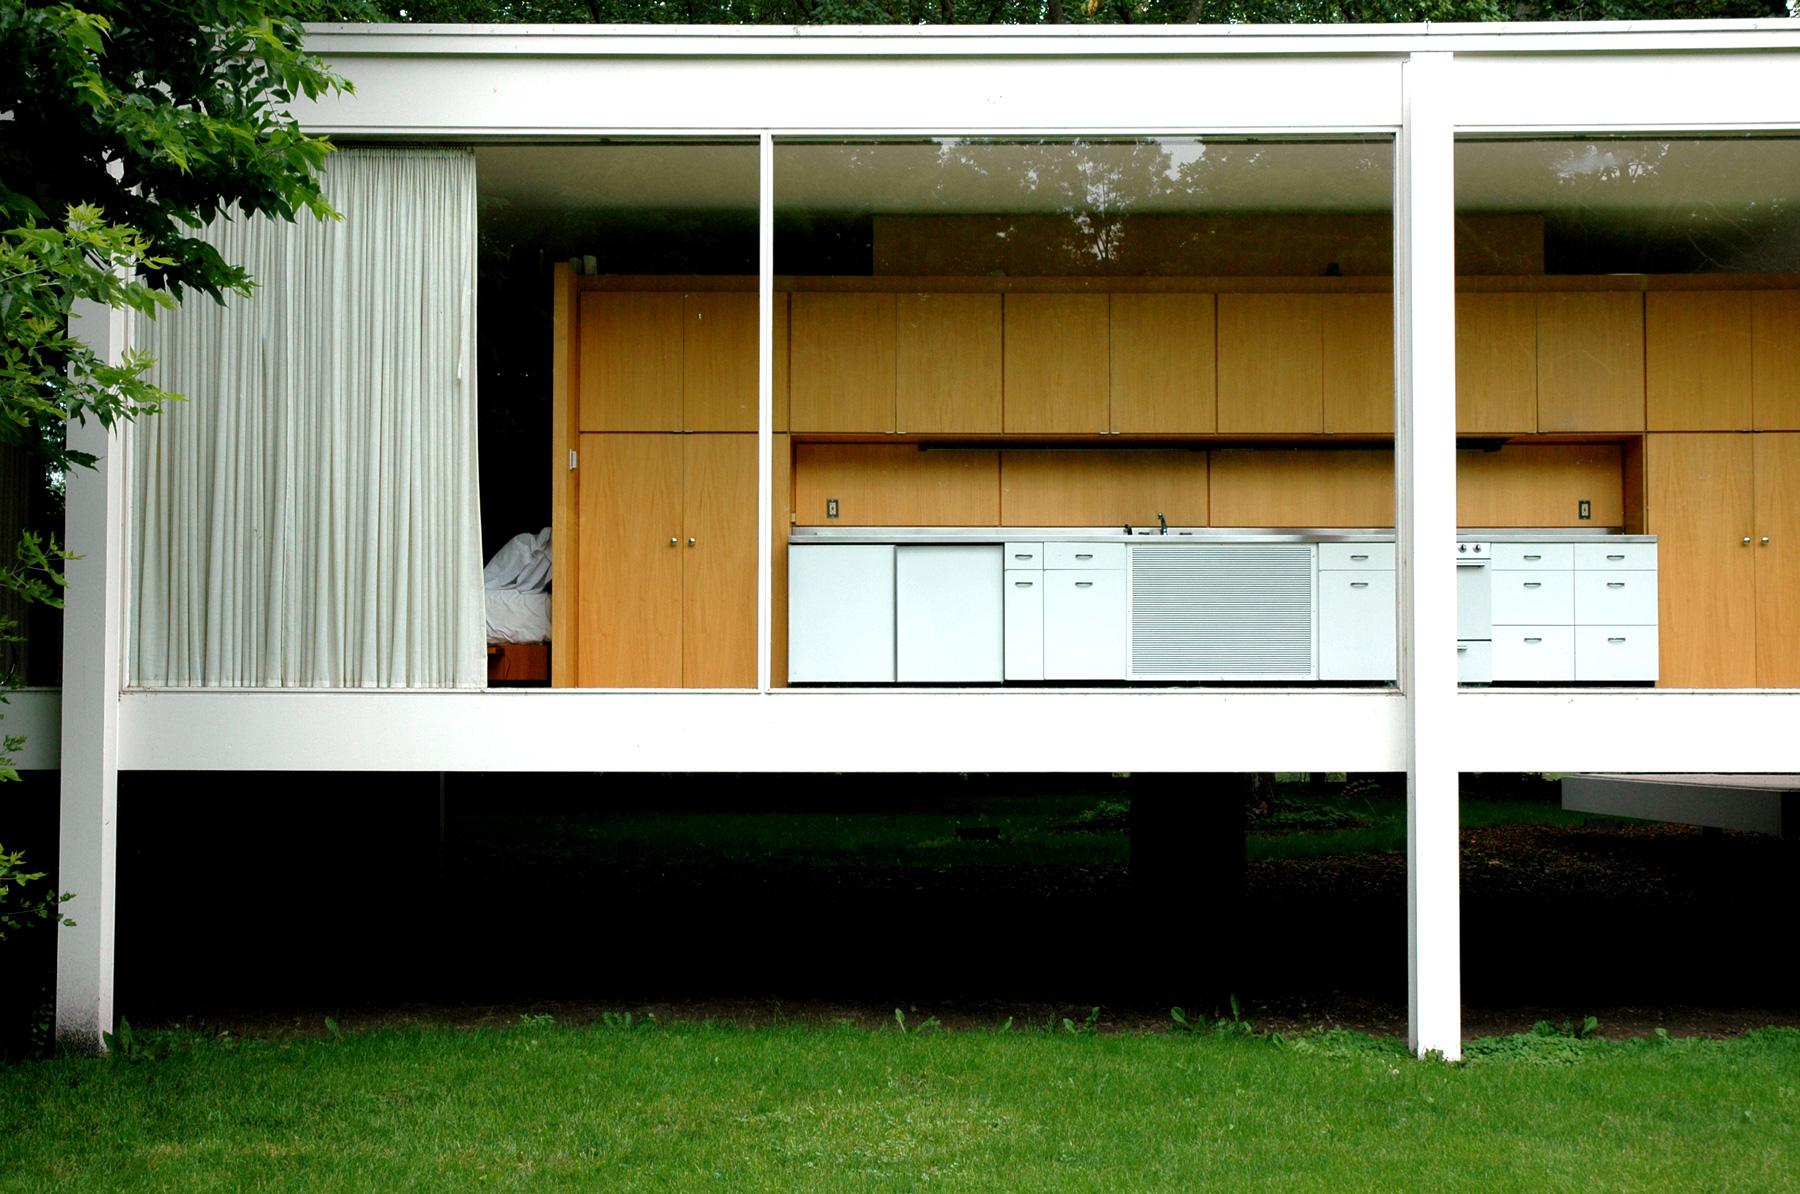 Farnsworth house dwg 2d for The farnsworth